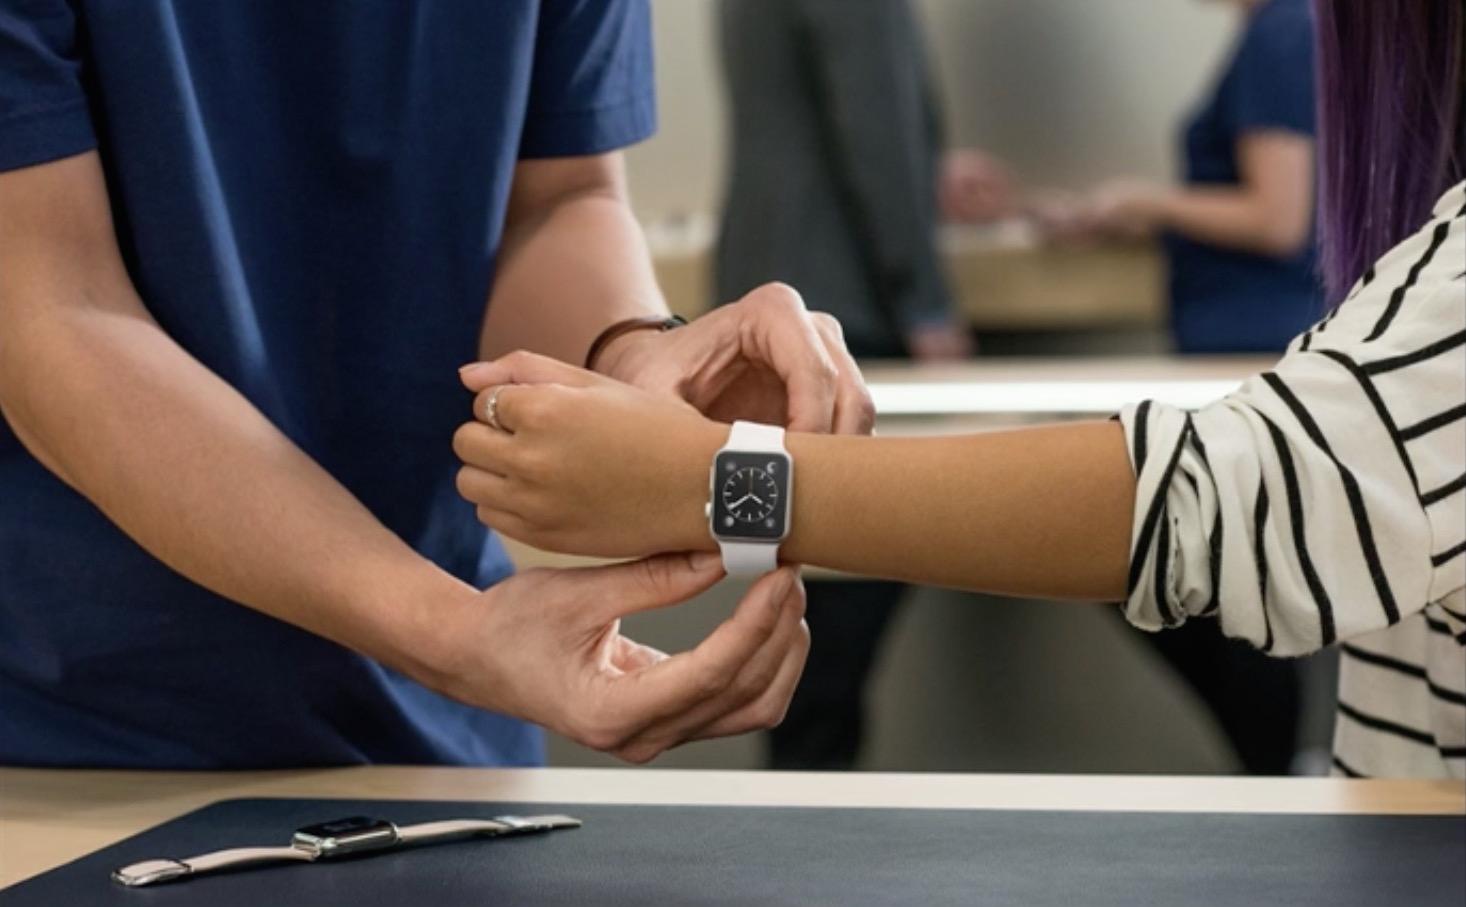 Apple Watchの発売日は4月24日から!予約と展示も10日から開始!